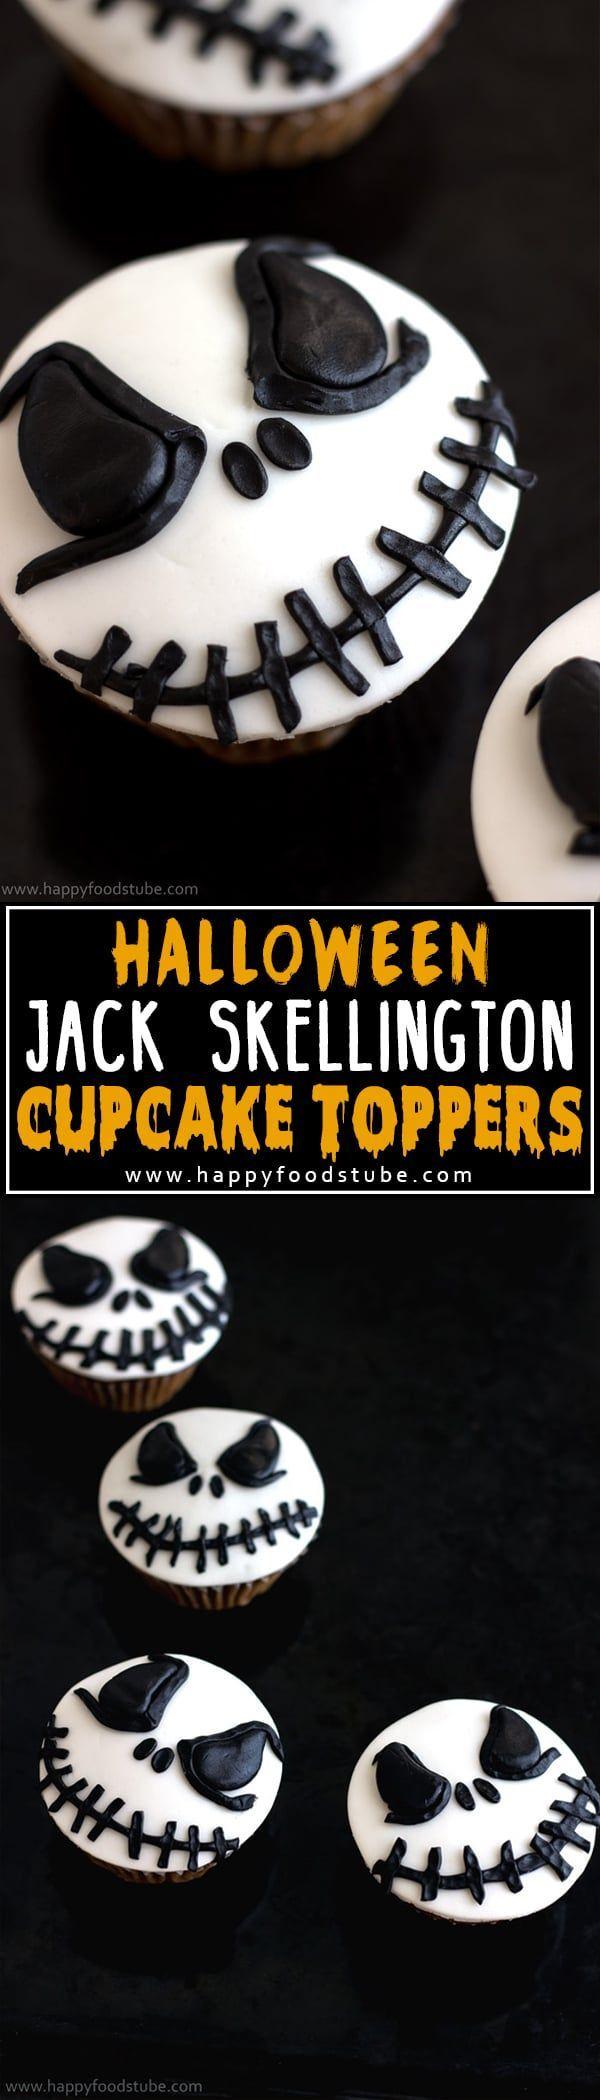 How to make Halloween Jack Skellington Cupcake Toppers. Easy cake/cupcake decorating video tutorial via @happyfoodstube